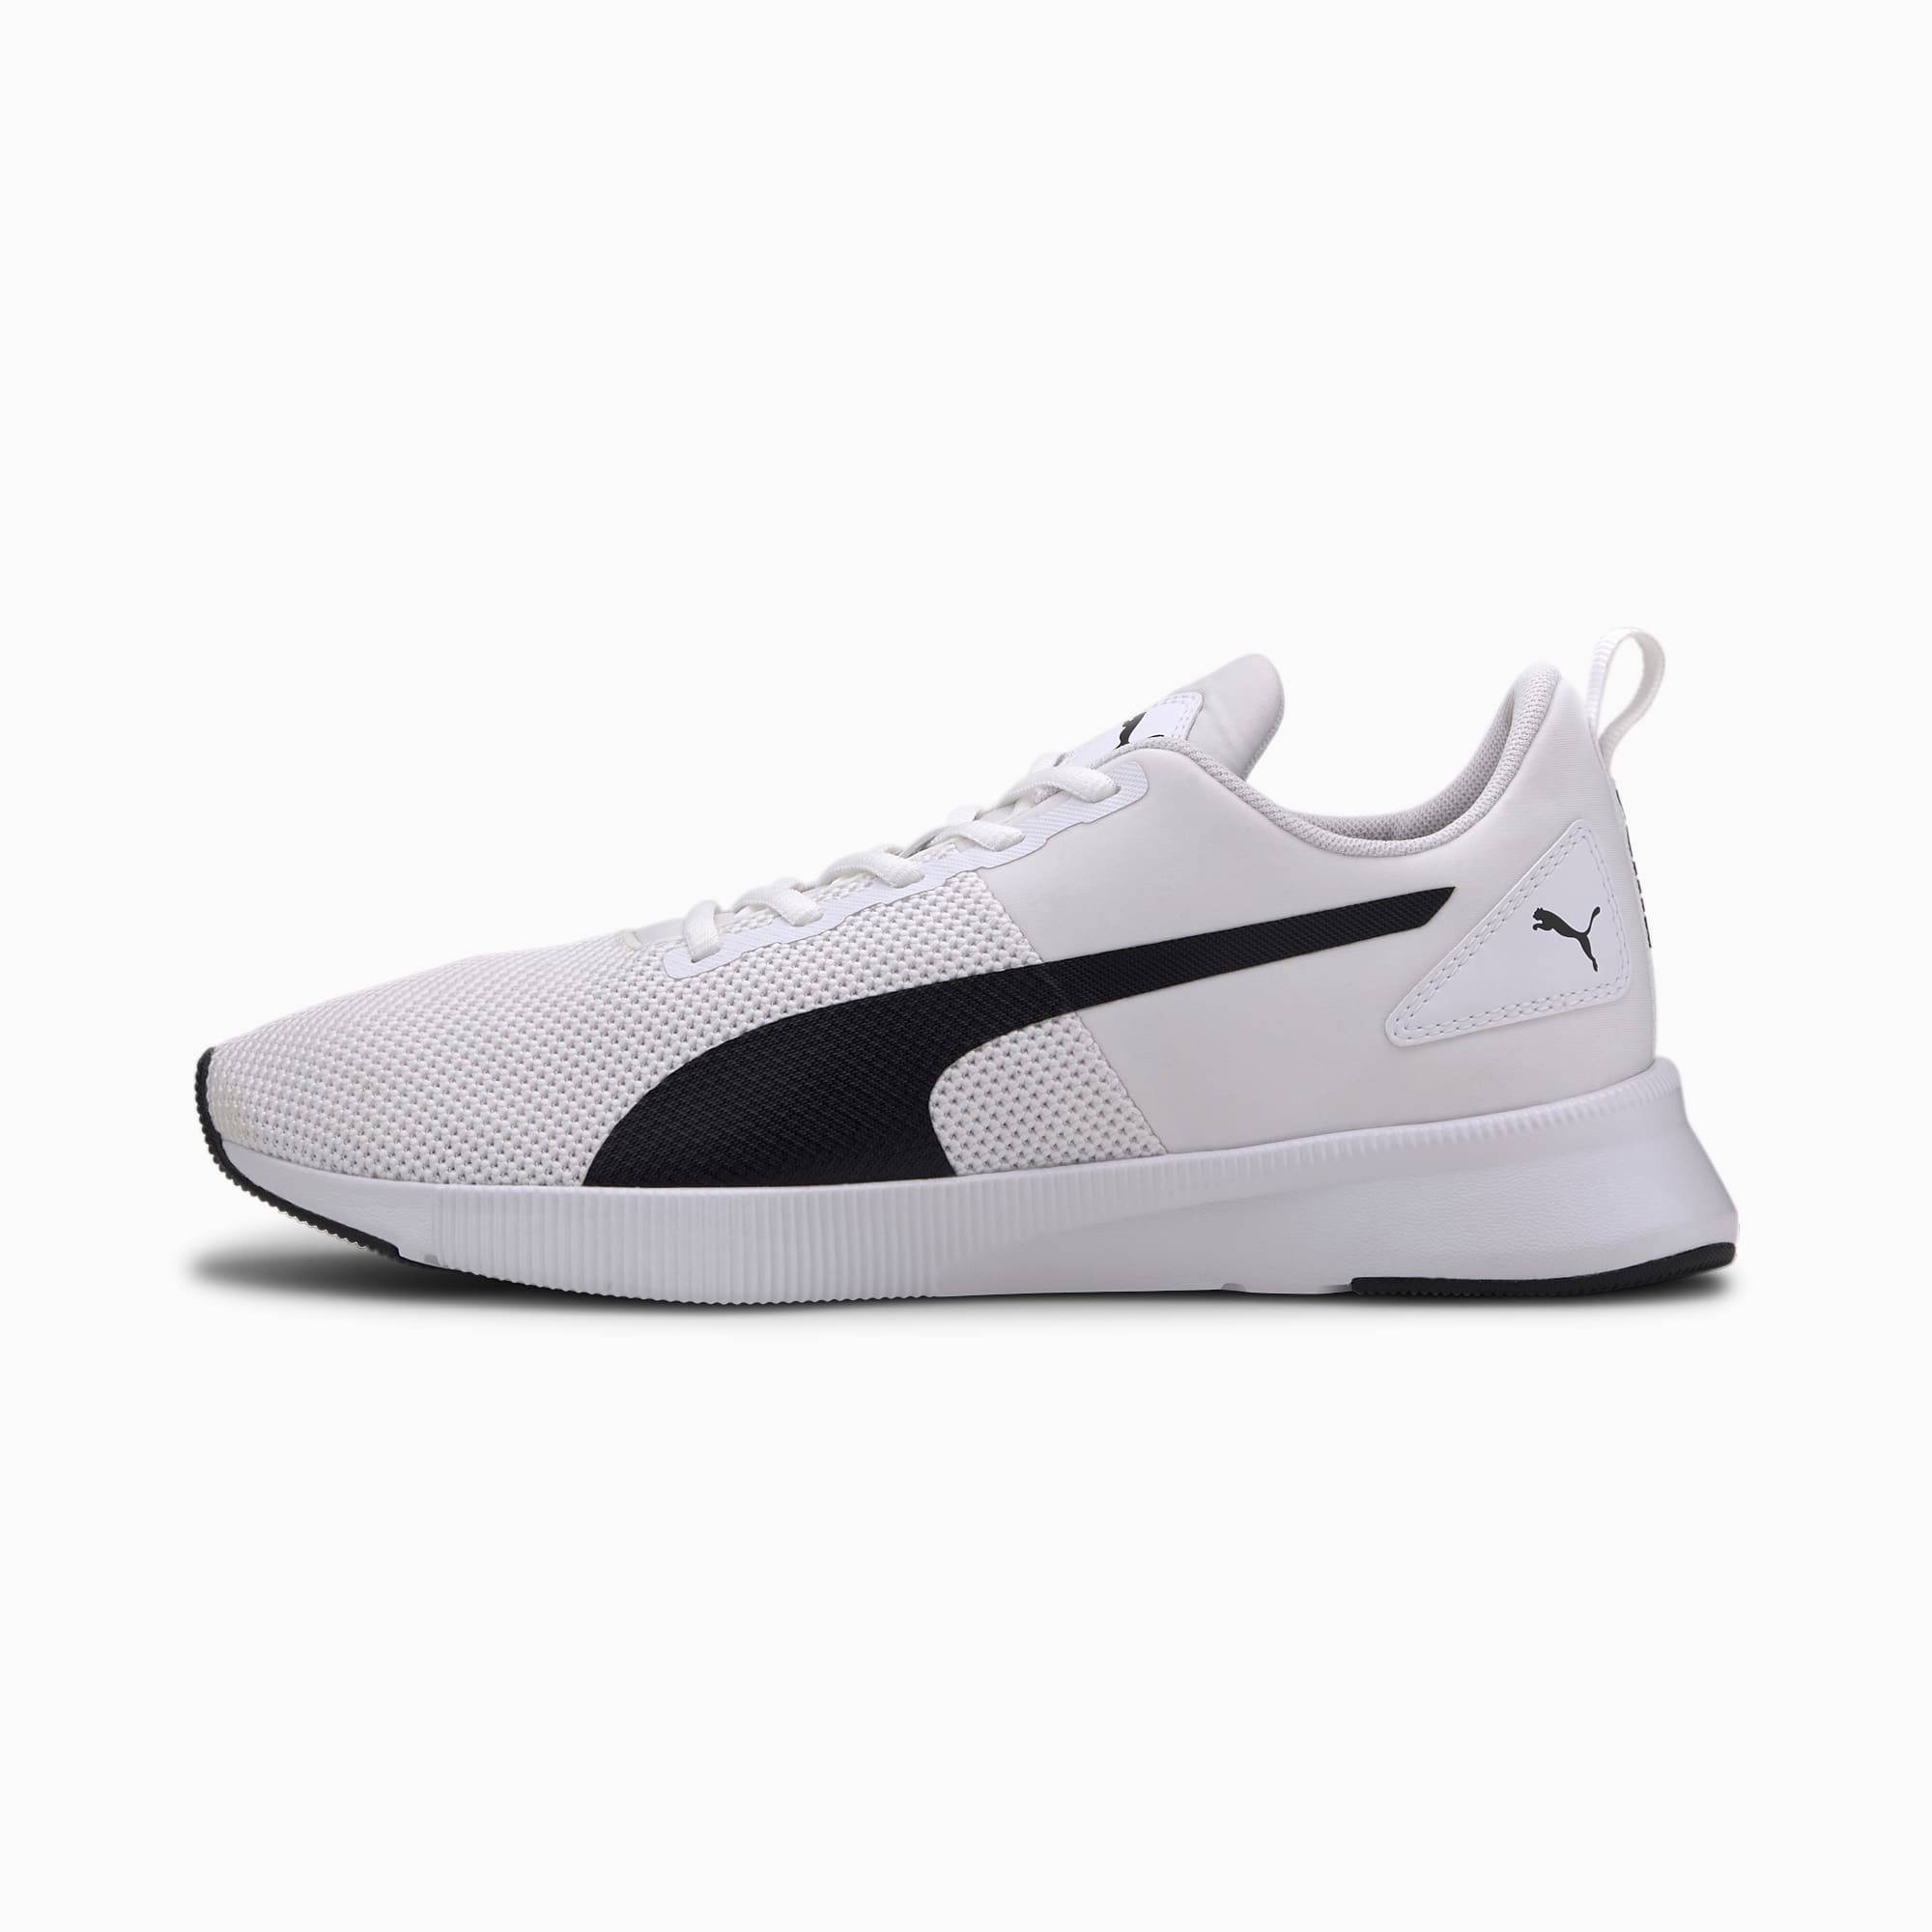 PUMA Chaussure de course Flyer Runner, Blanc/Noir, Taille 40, Chaussures